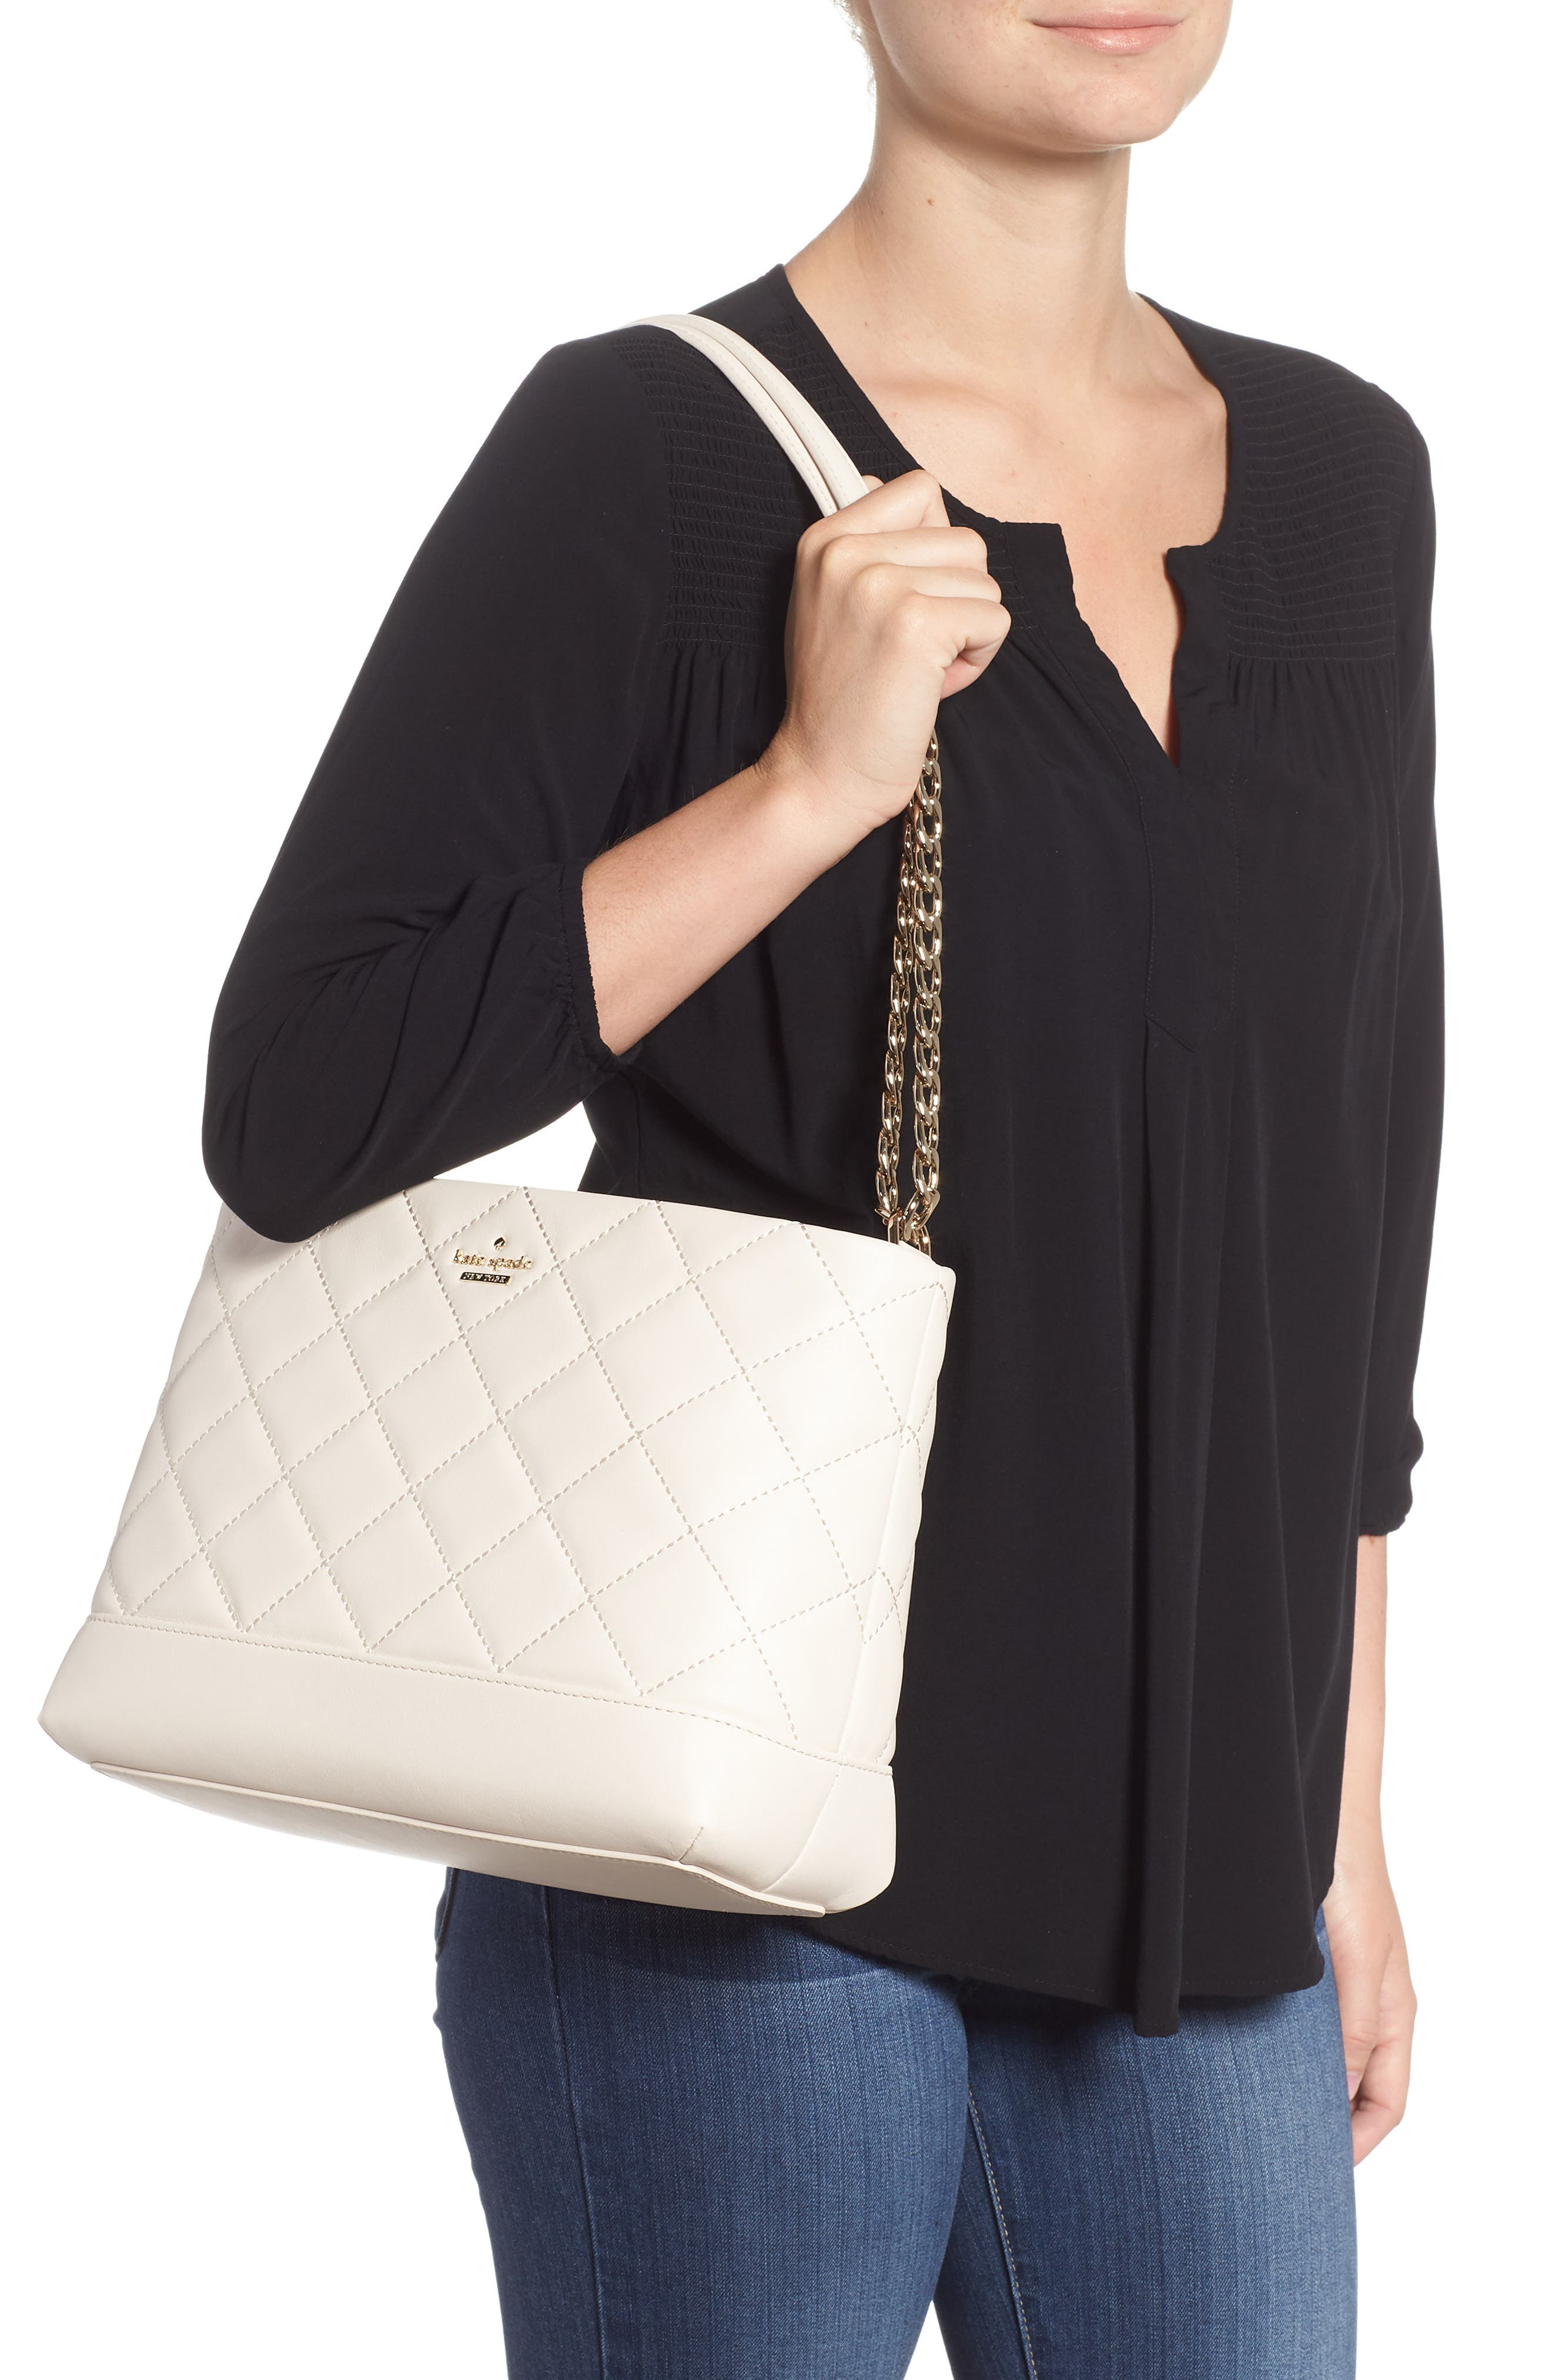 emerson place lorie quilted leather shoulder bag,                             Alternate thumbnail 2, color,                             Bleach Bone